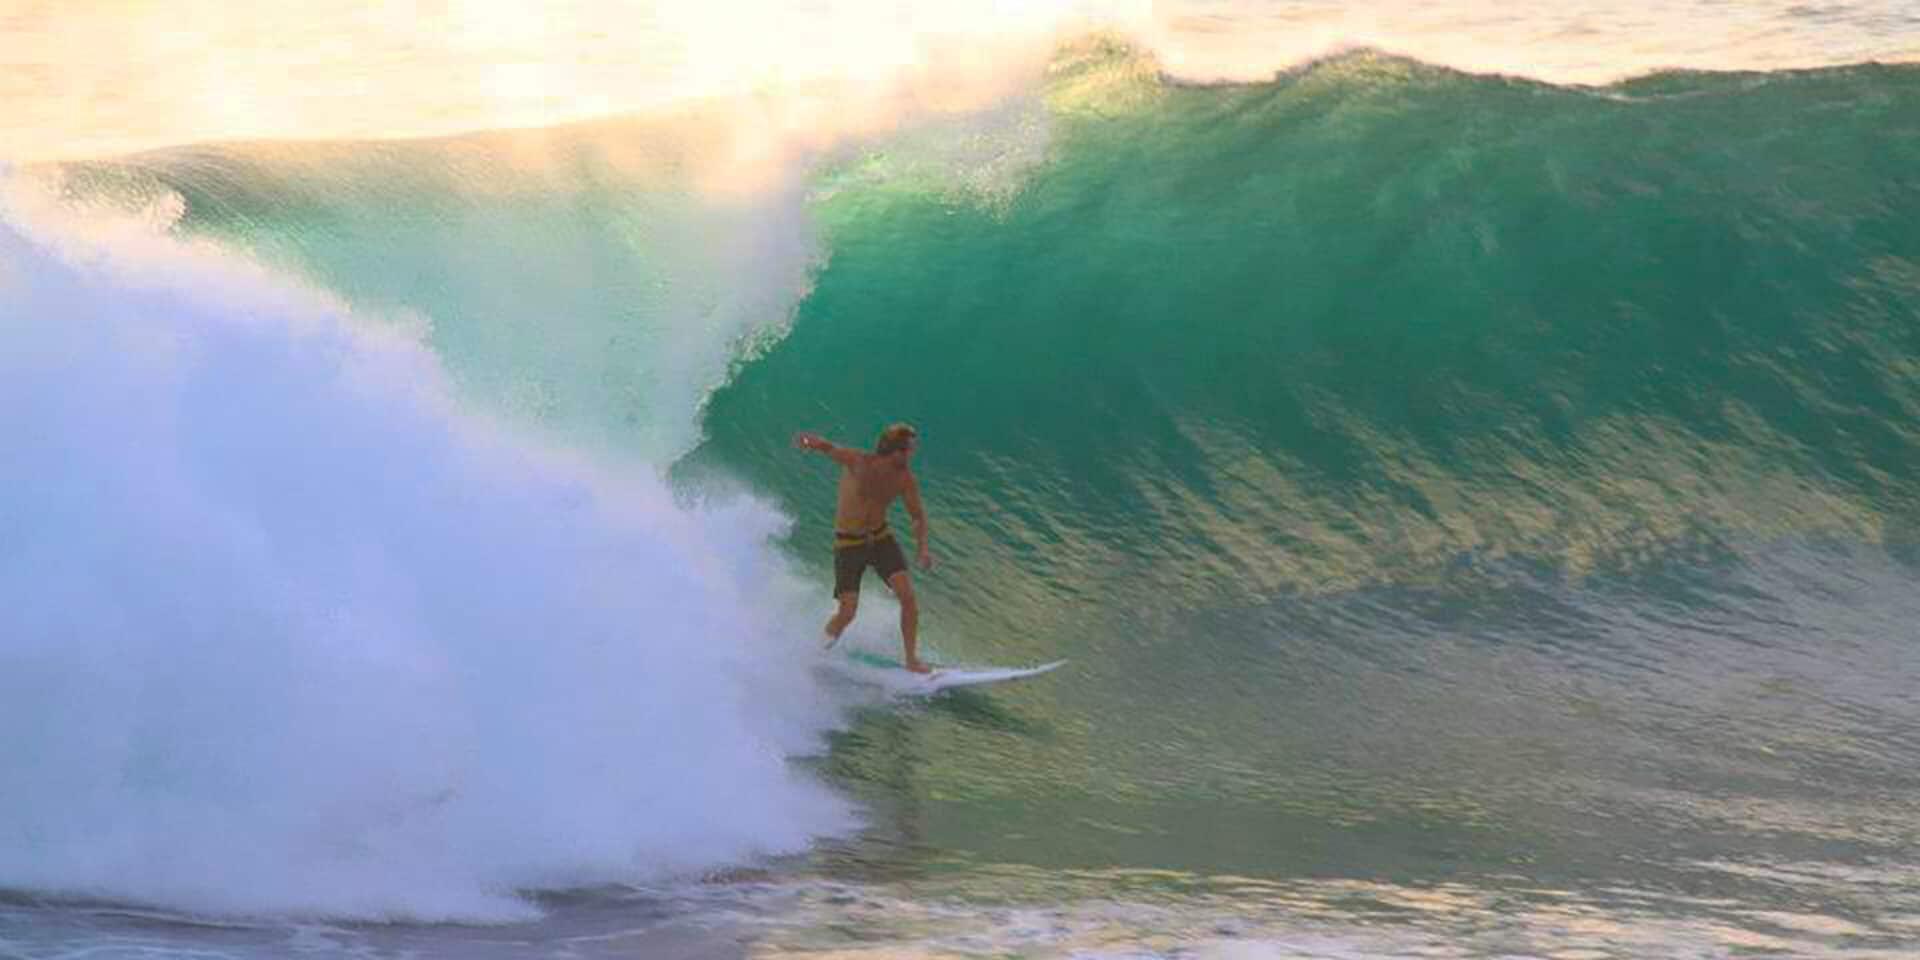 surfing uluwatu bali indonesia guide